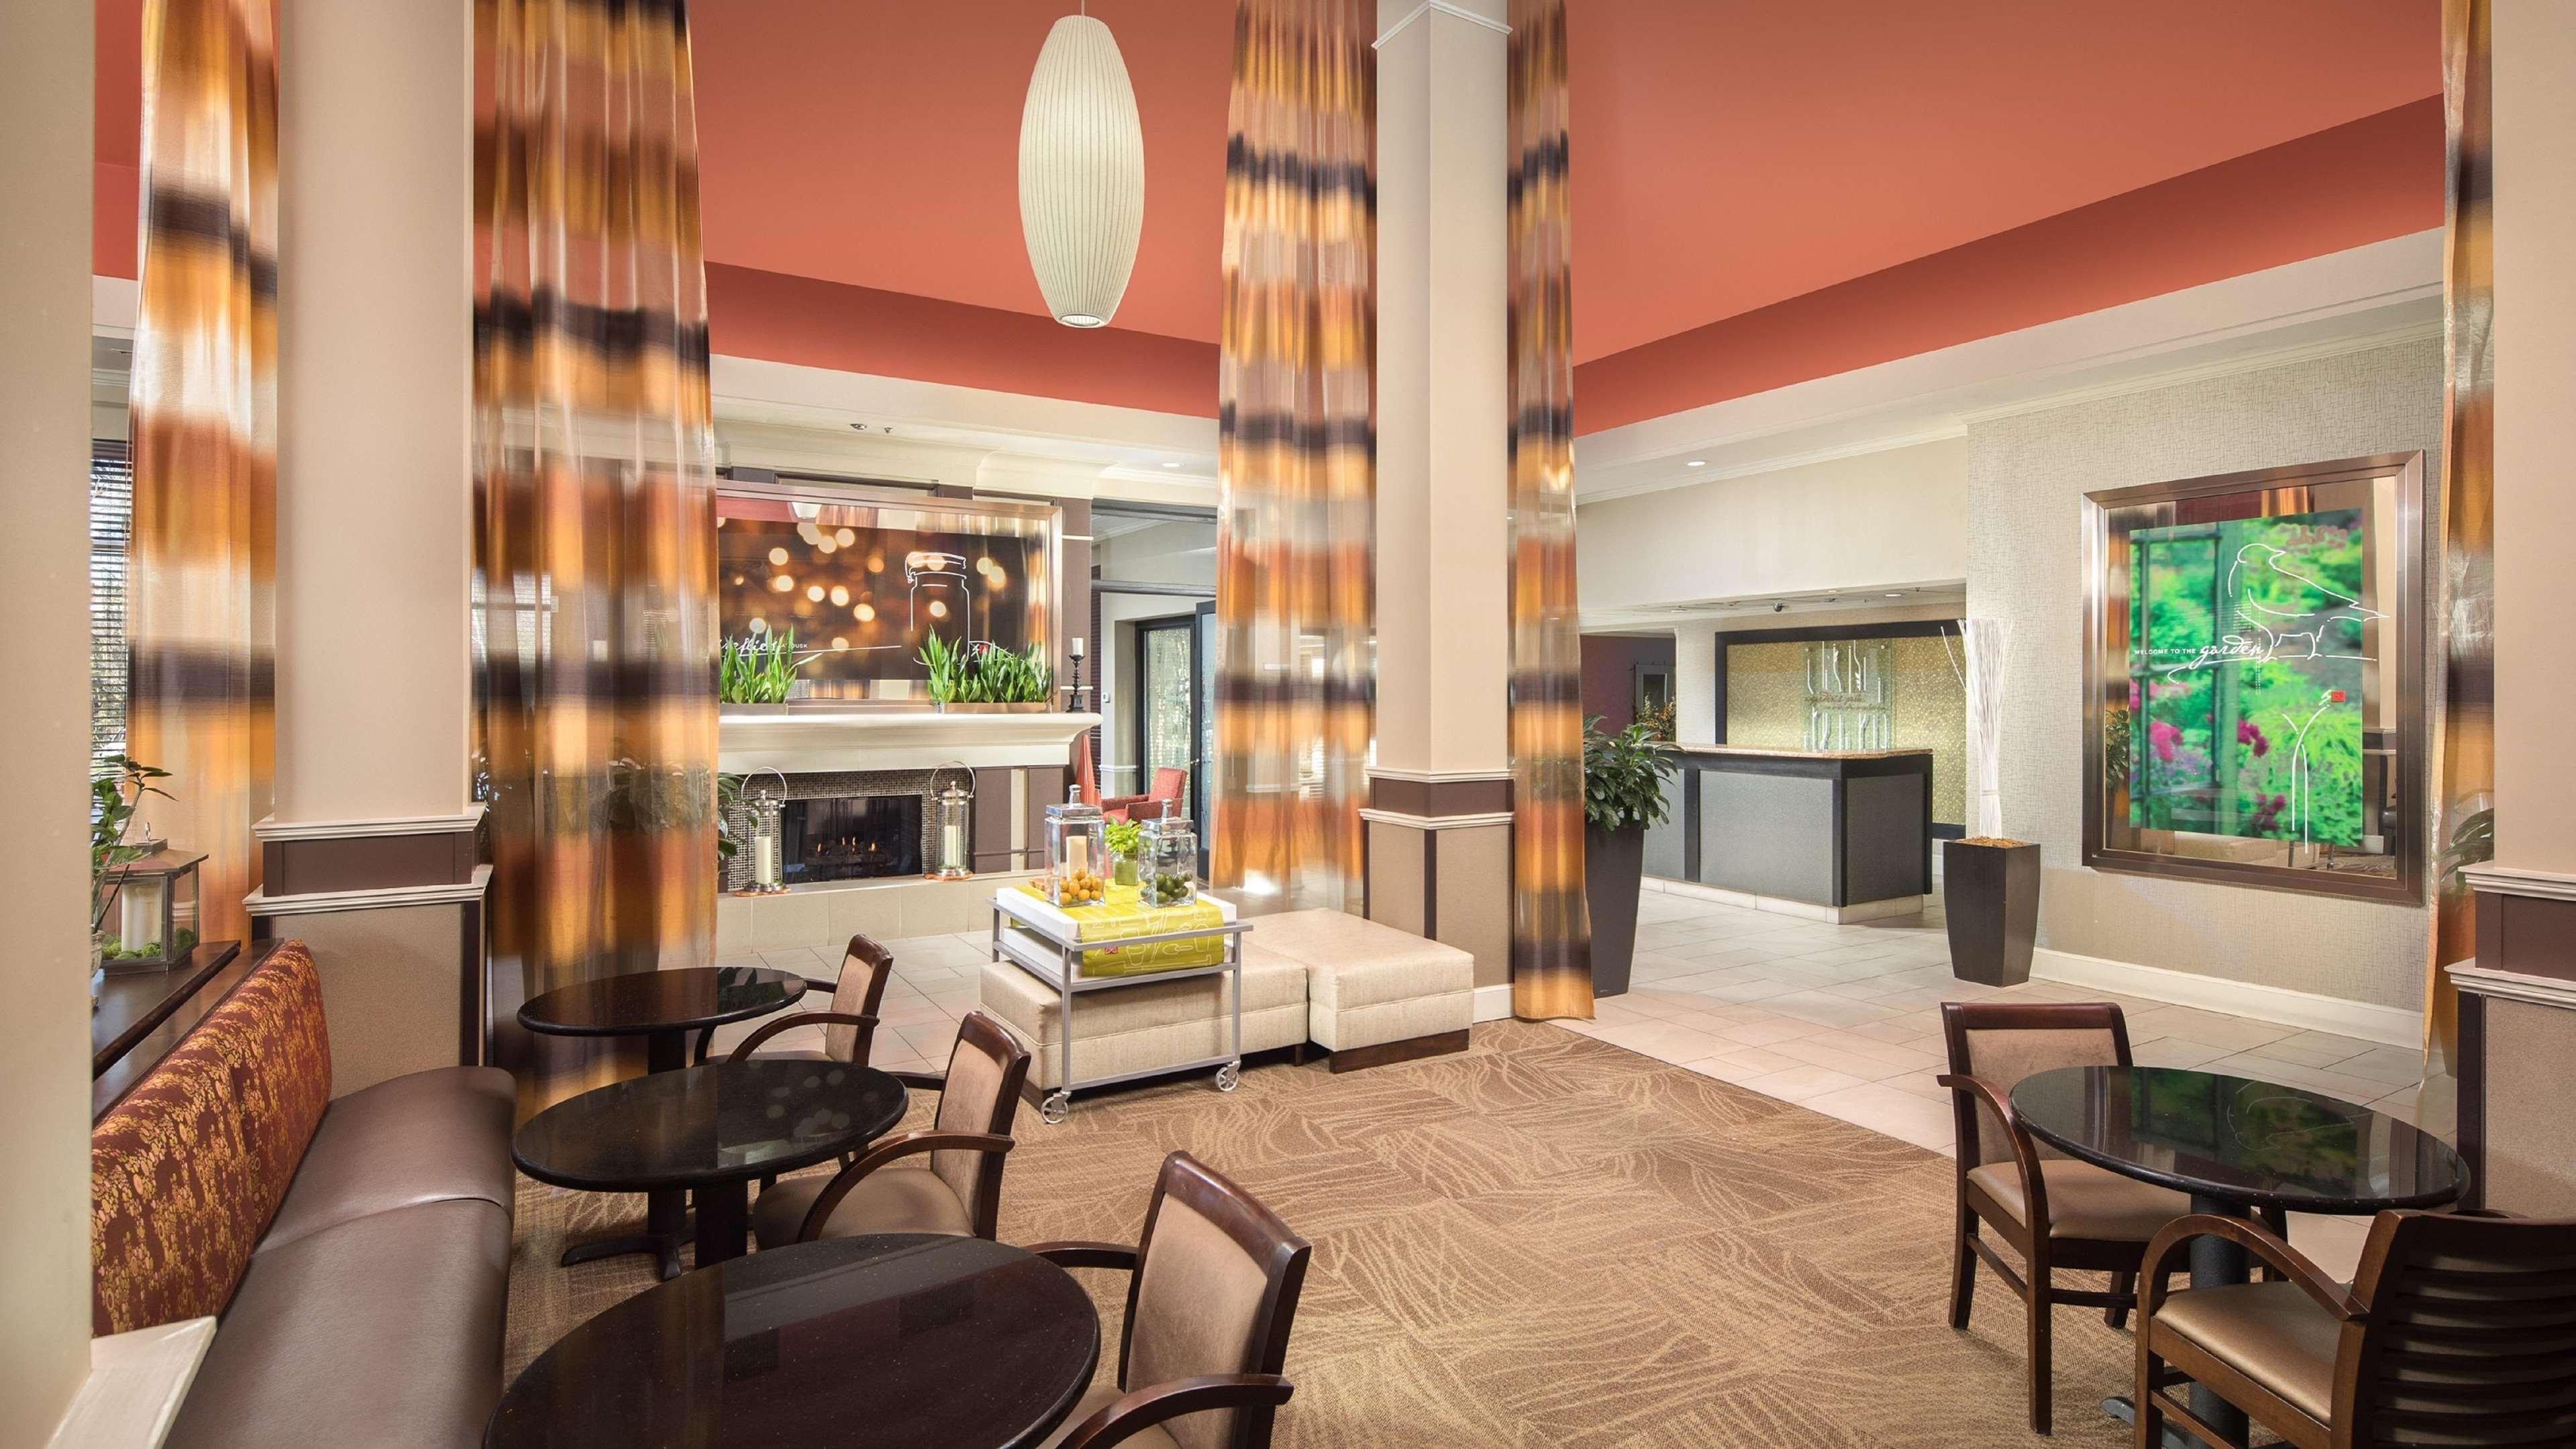 Hilton Garden Inn Chattanooga Hamilton Place In Chattanooga Tn 37421